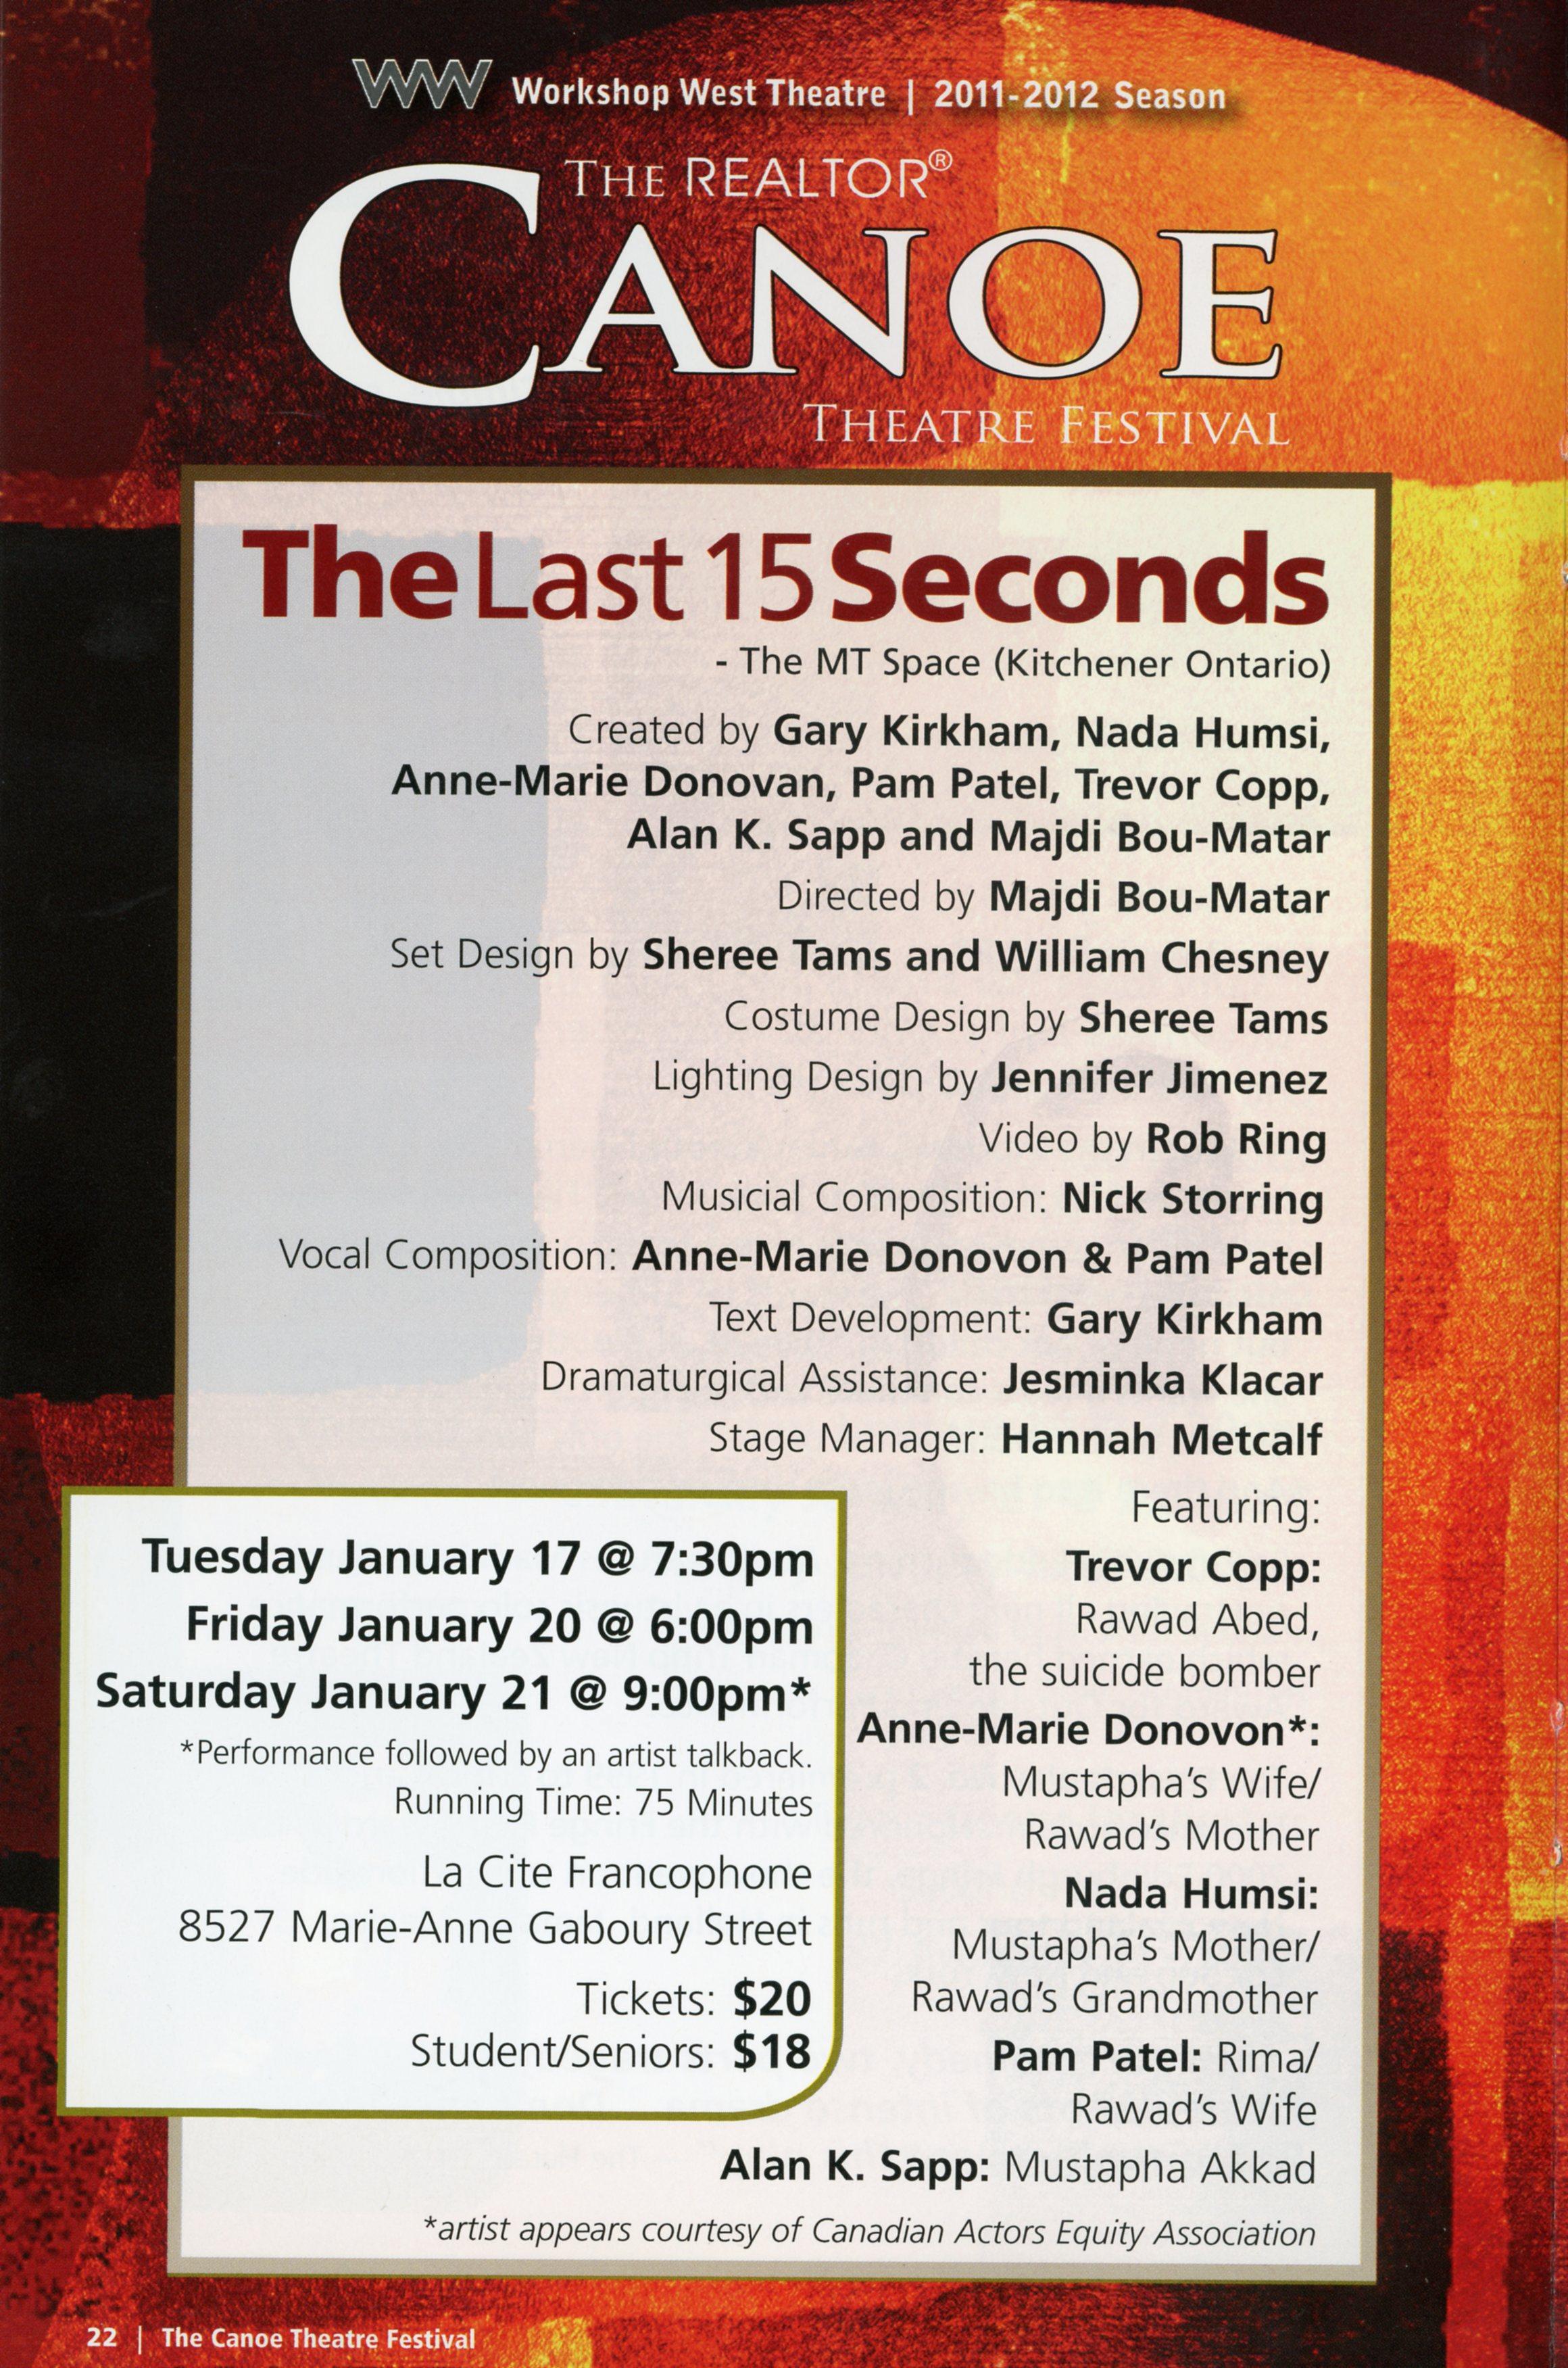 Canoe Theatre Festival (January, 2012)- Production  Information-The Last 15 Seconds_JPEG.jpg